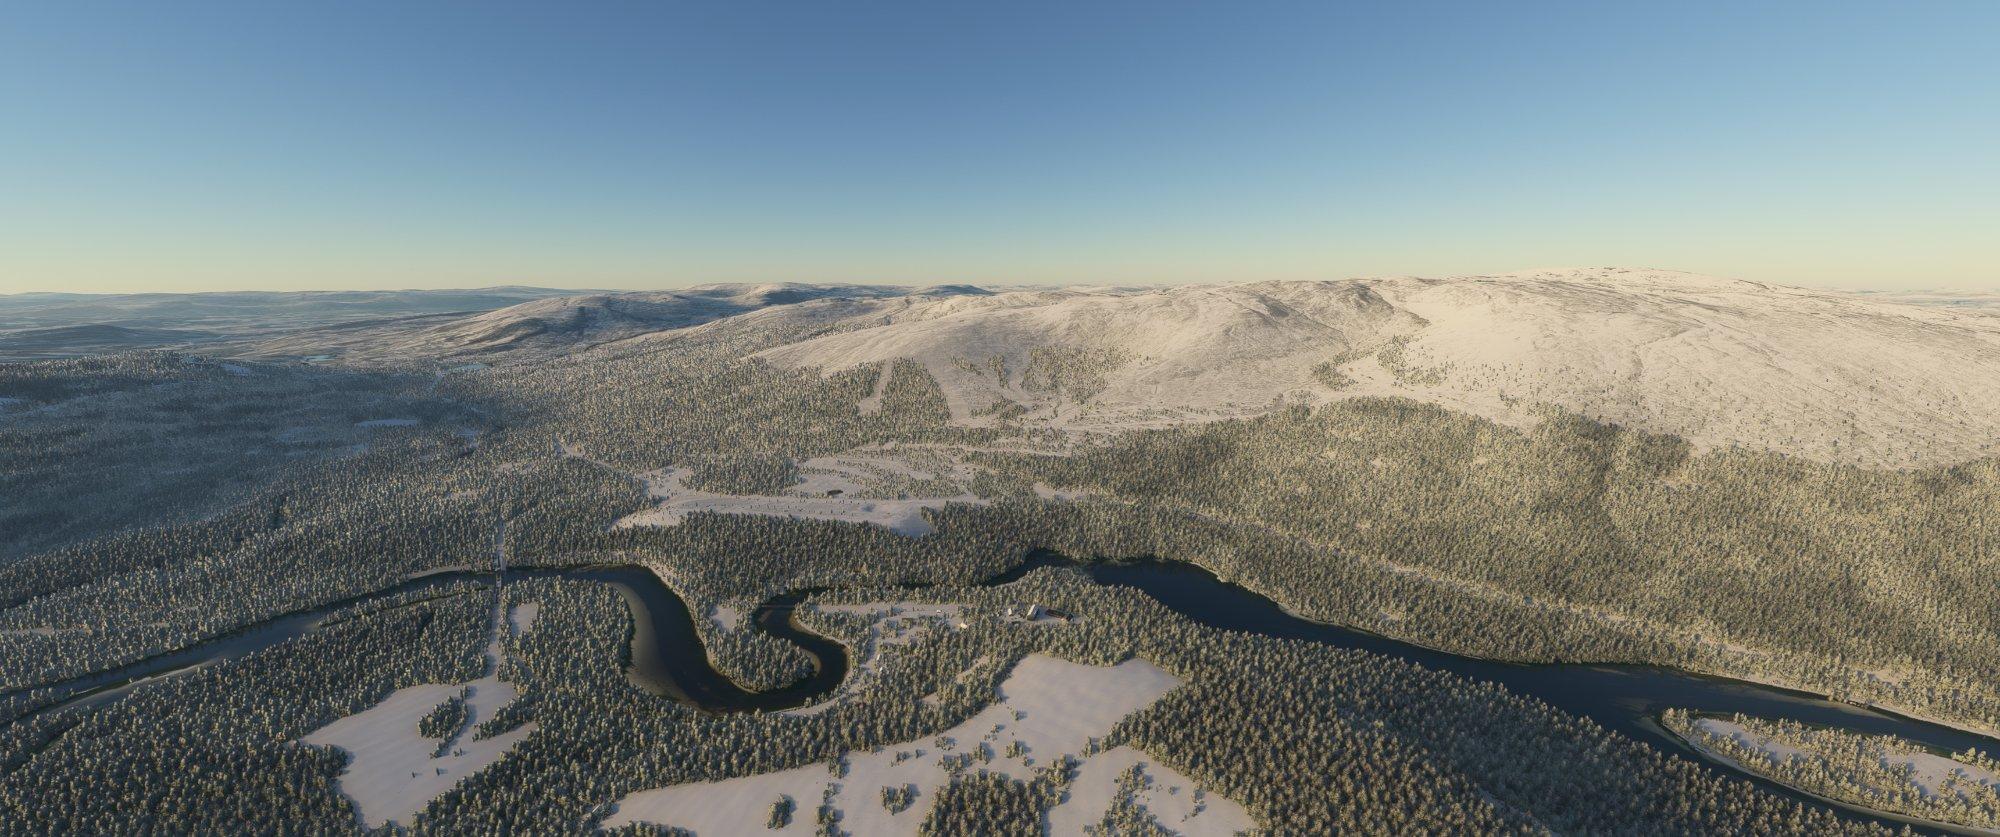 Microsoft Flight Simulator Screenshot 2021.04.27 - 10.13.05.76.jpg